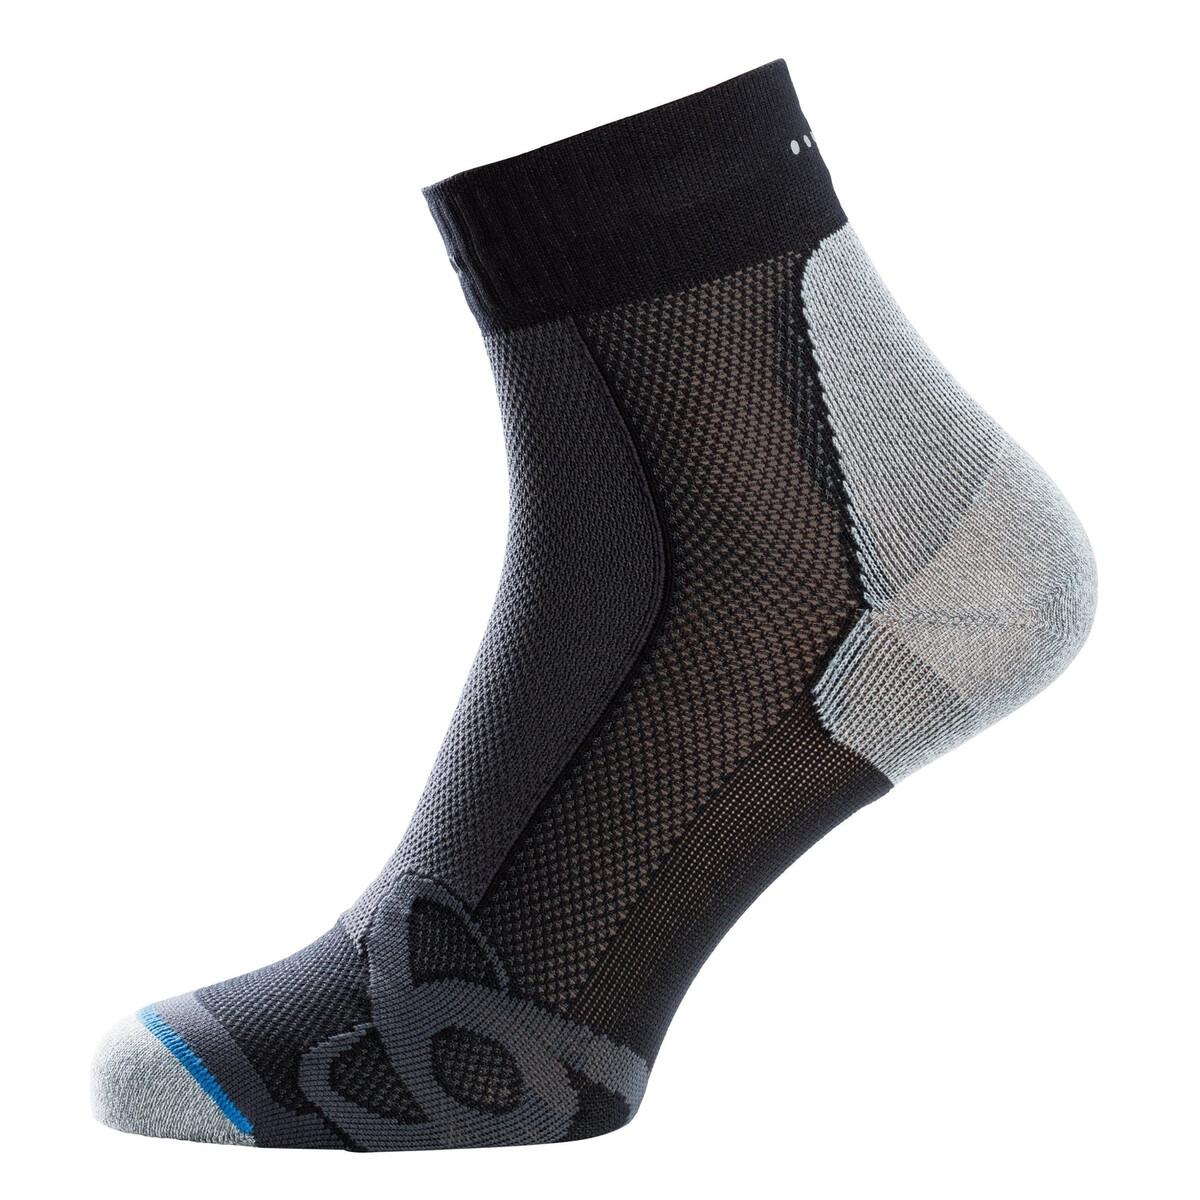 Kniestrümpfe Odlo ELEMENT Skisocken Outdoor Socken schwarz